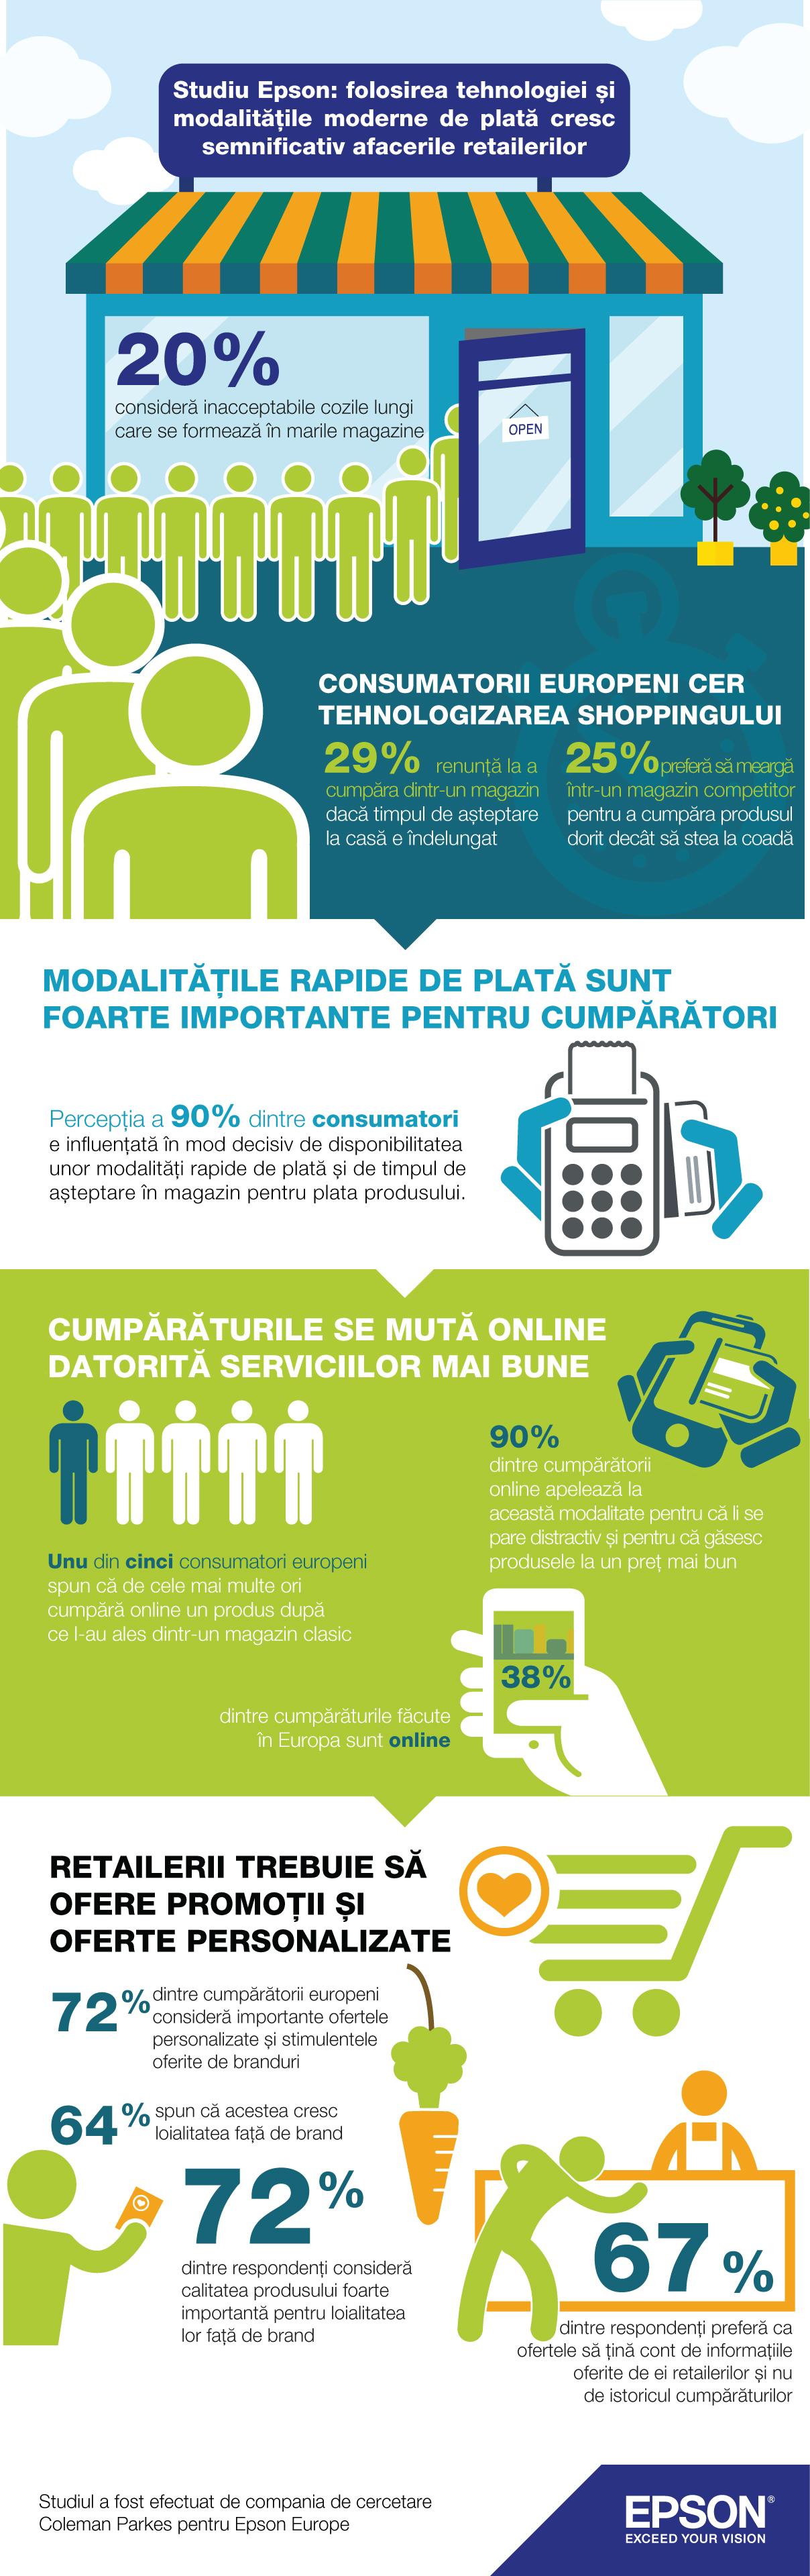 infografic epson